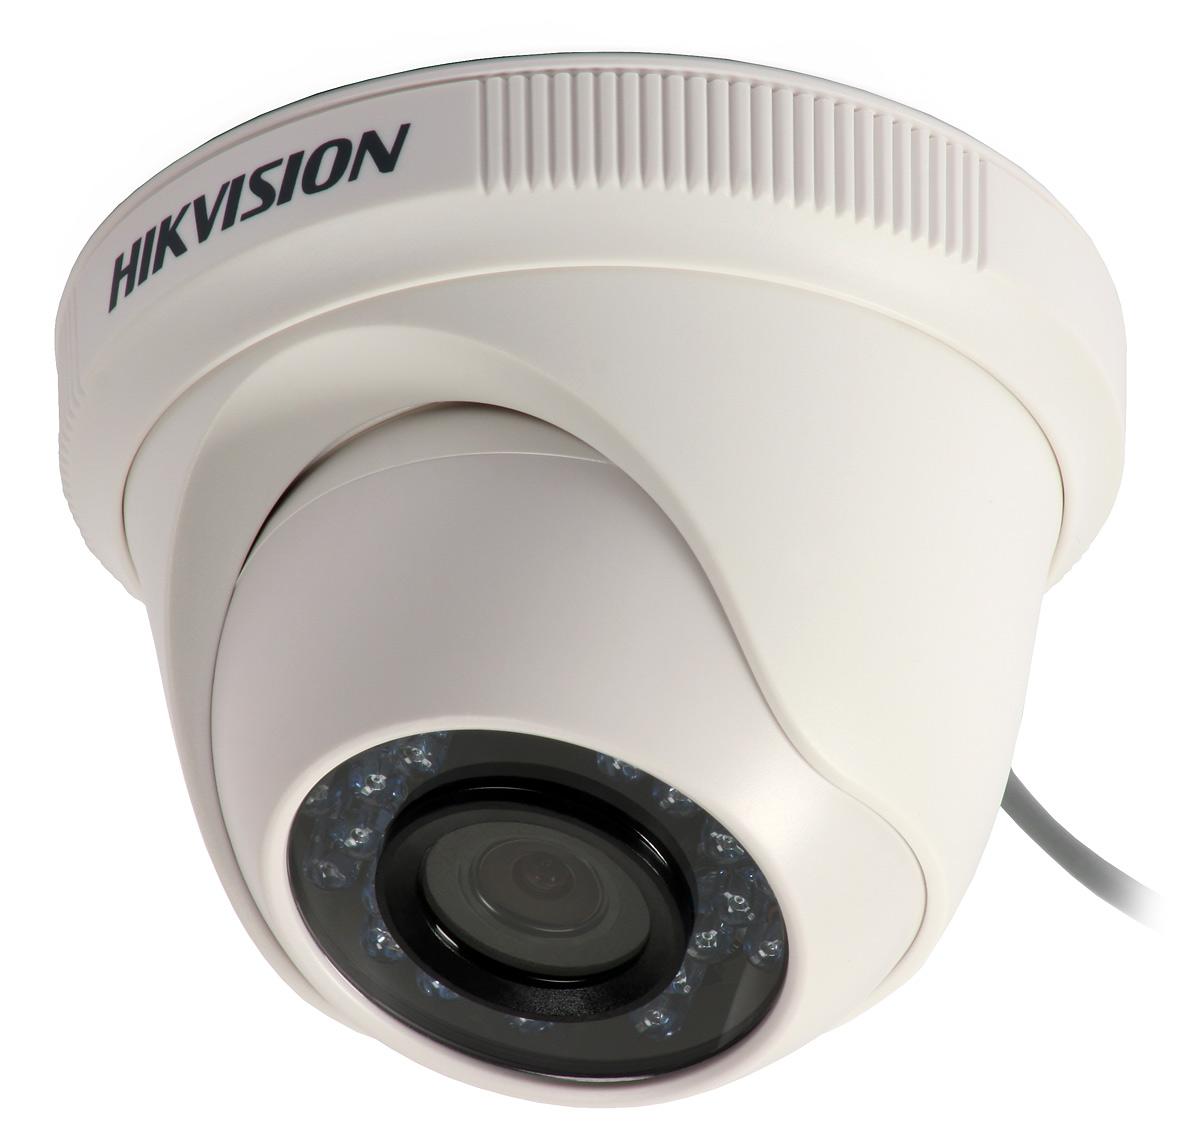 camera dome ir 2.0 megapixel hd 1080p 20mts lente 3.6mm ds-2ce56d0t-irpf - hikvision